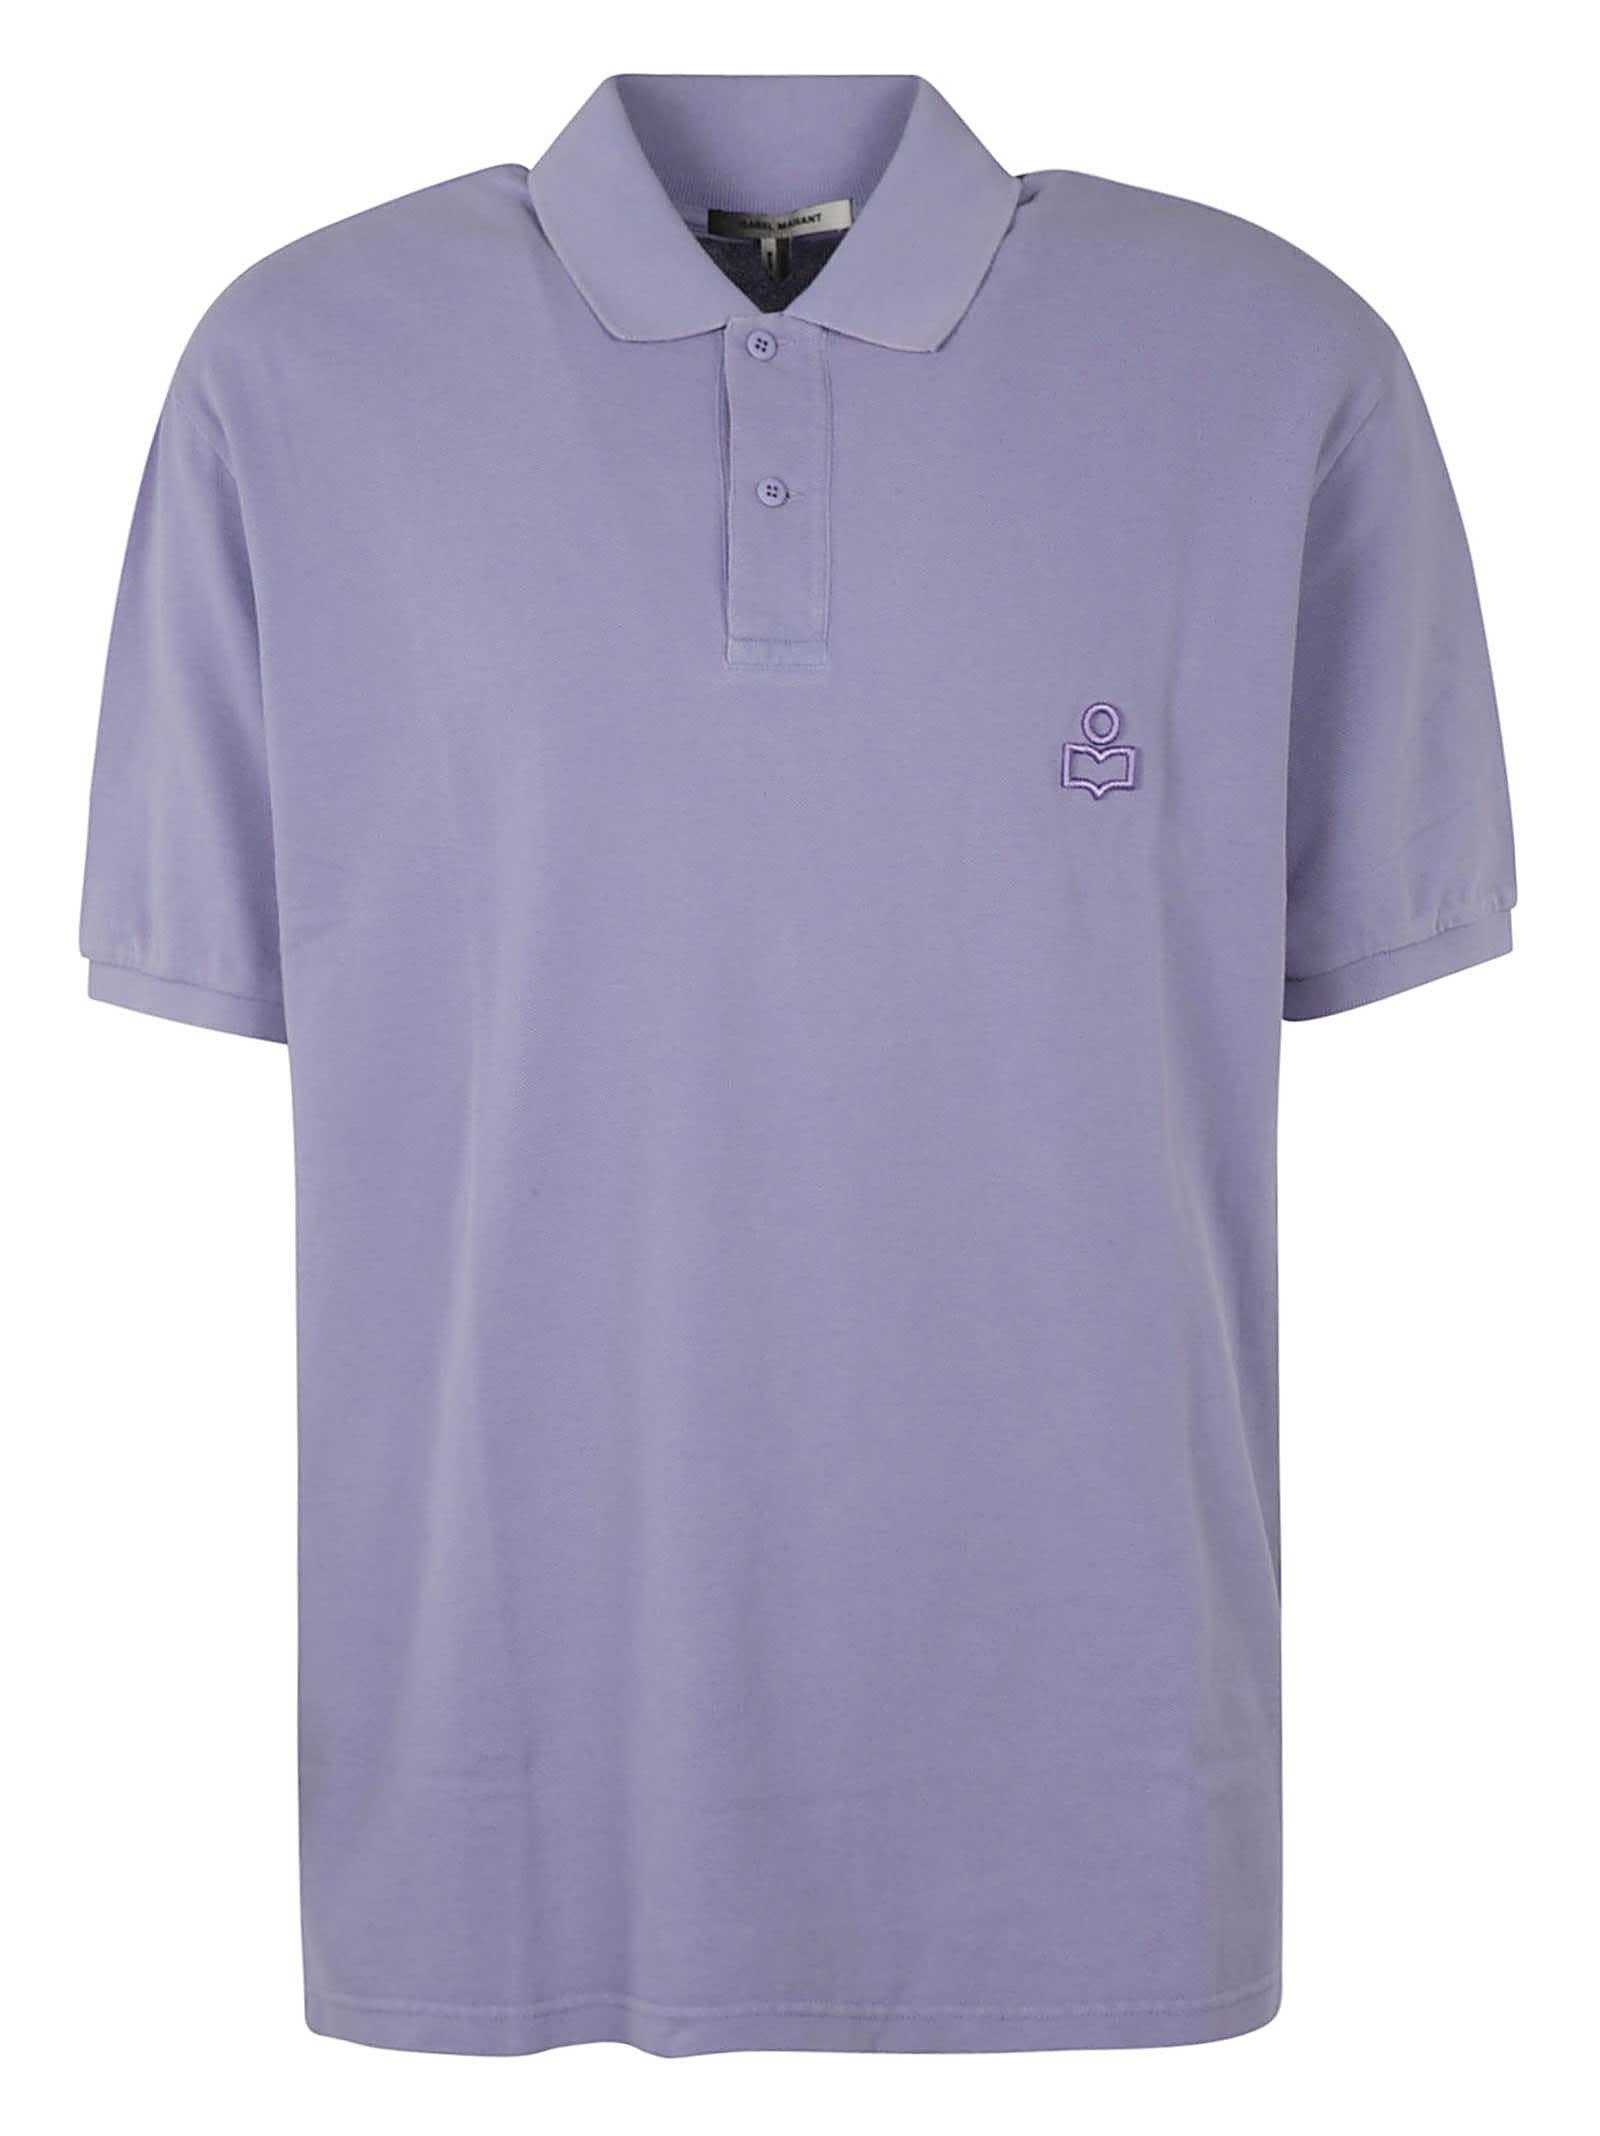 Isabel Marant Anafiko Polo Shirt